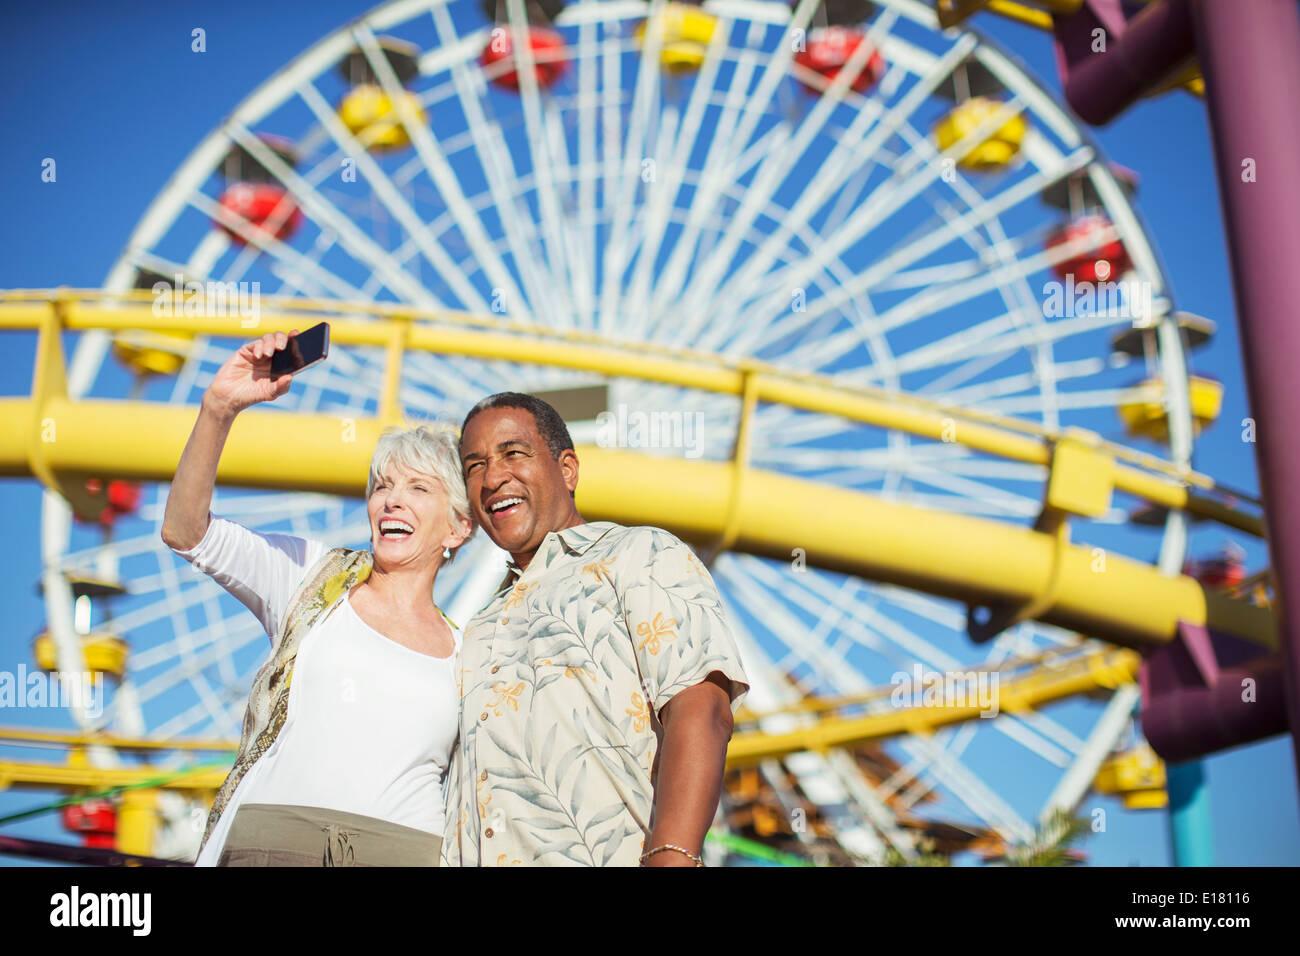 Enthusiastic senior couple taking selfie at amusement park - Stock Image